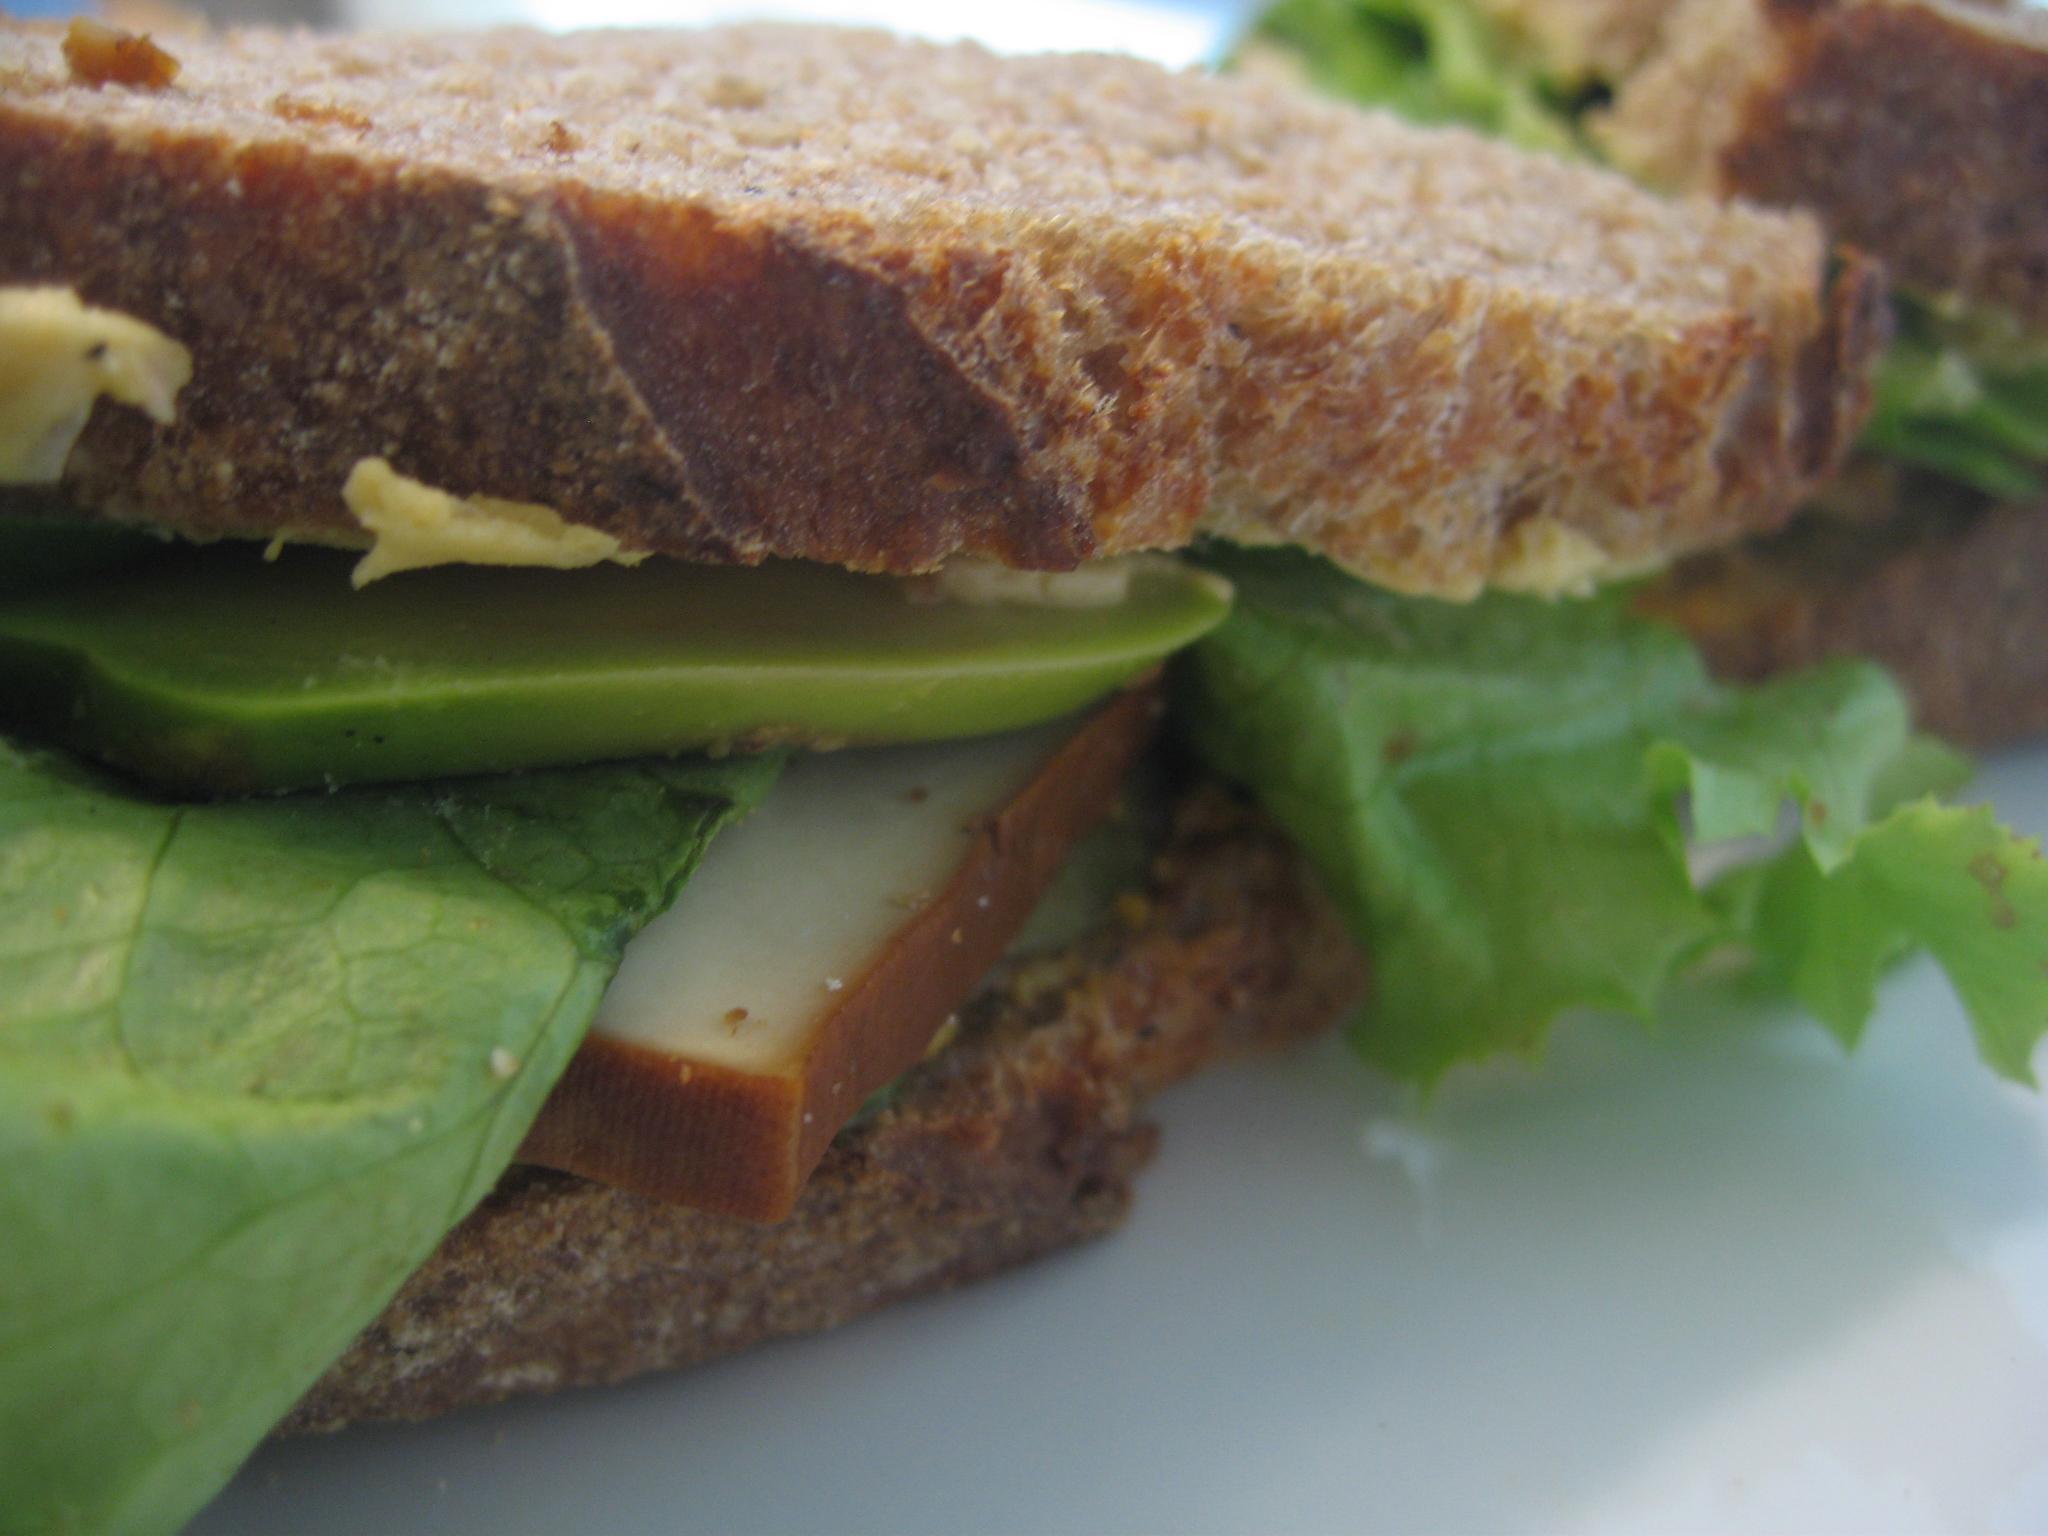 Organic Wholegrain Spelt Sourdough with smoked tofu, lettuce, hummus, roasted veggie spread, and a few avocado slices.